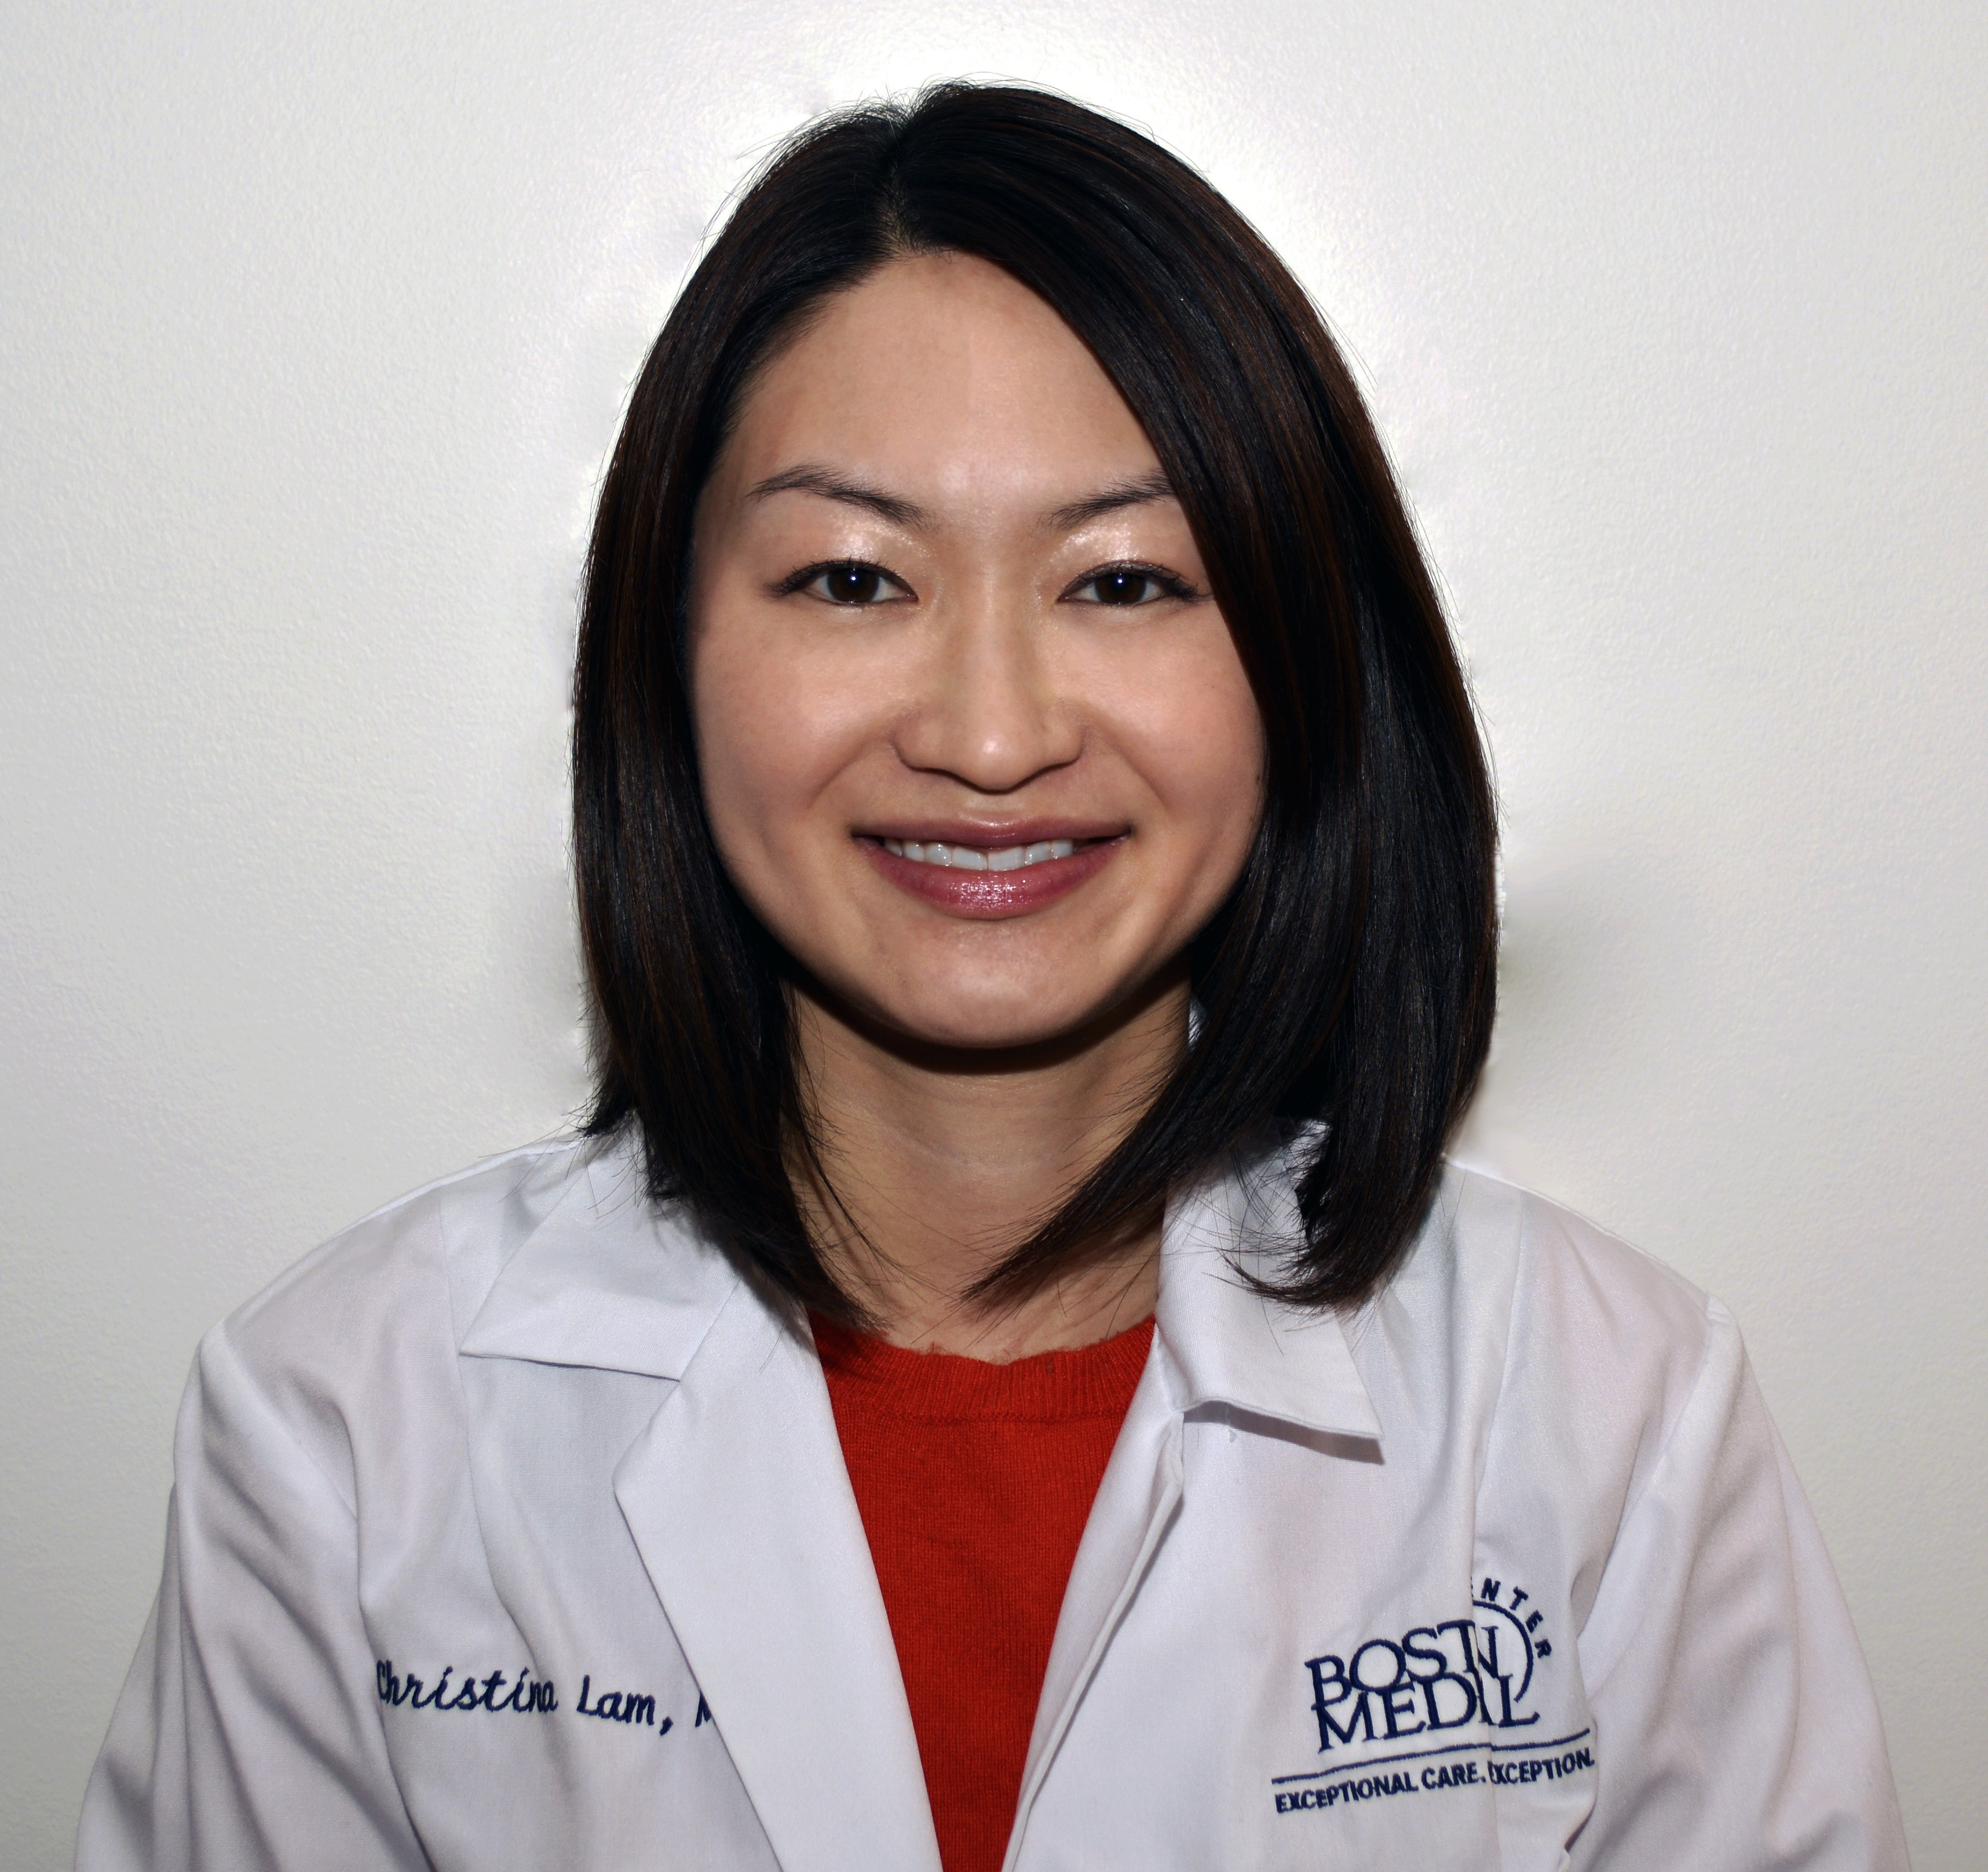 Dermatology: Dermatology Clinic: Boston Medical Center Dermatology Clinic